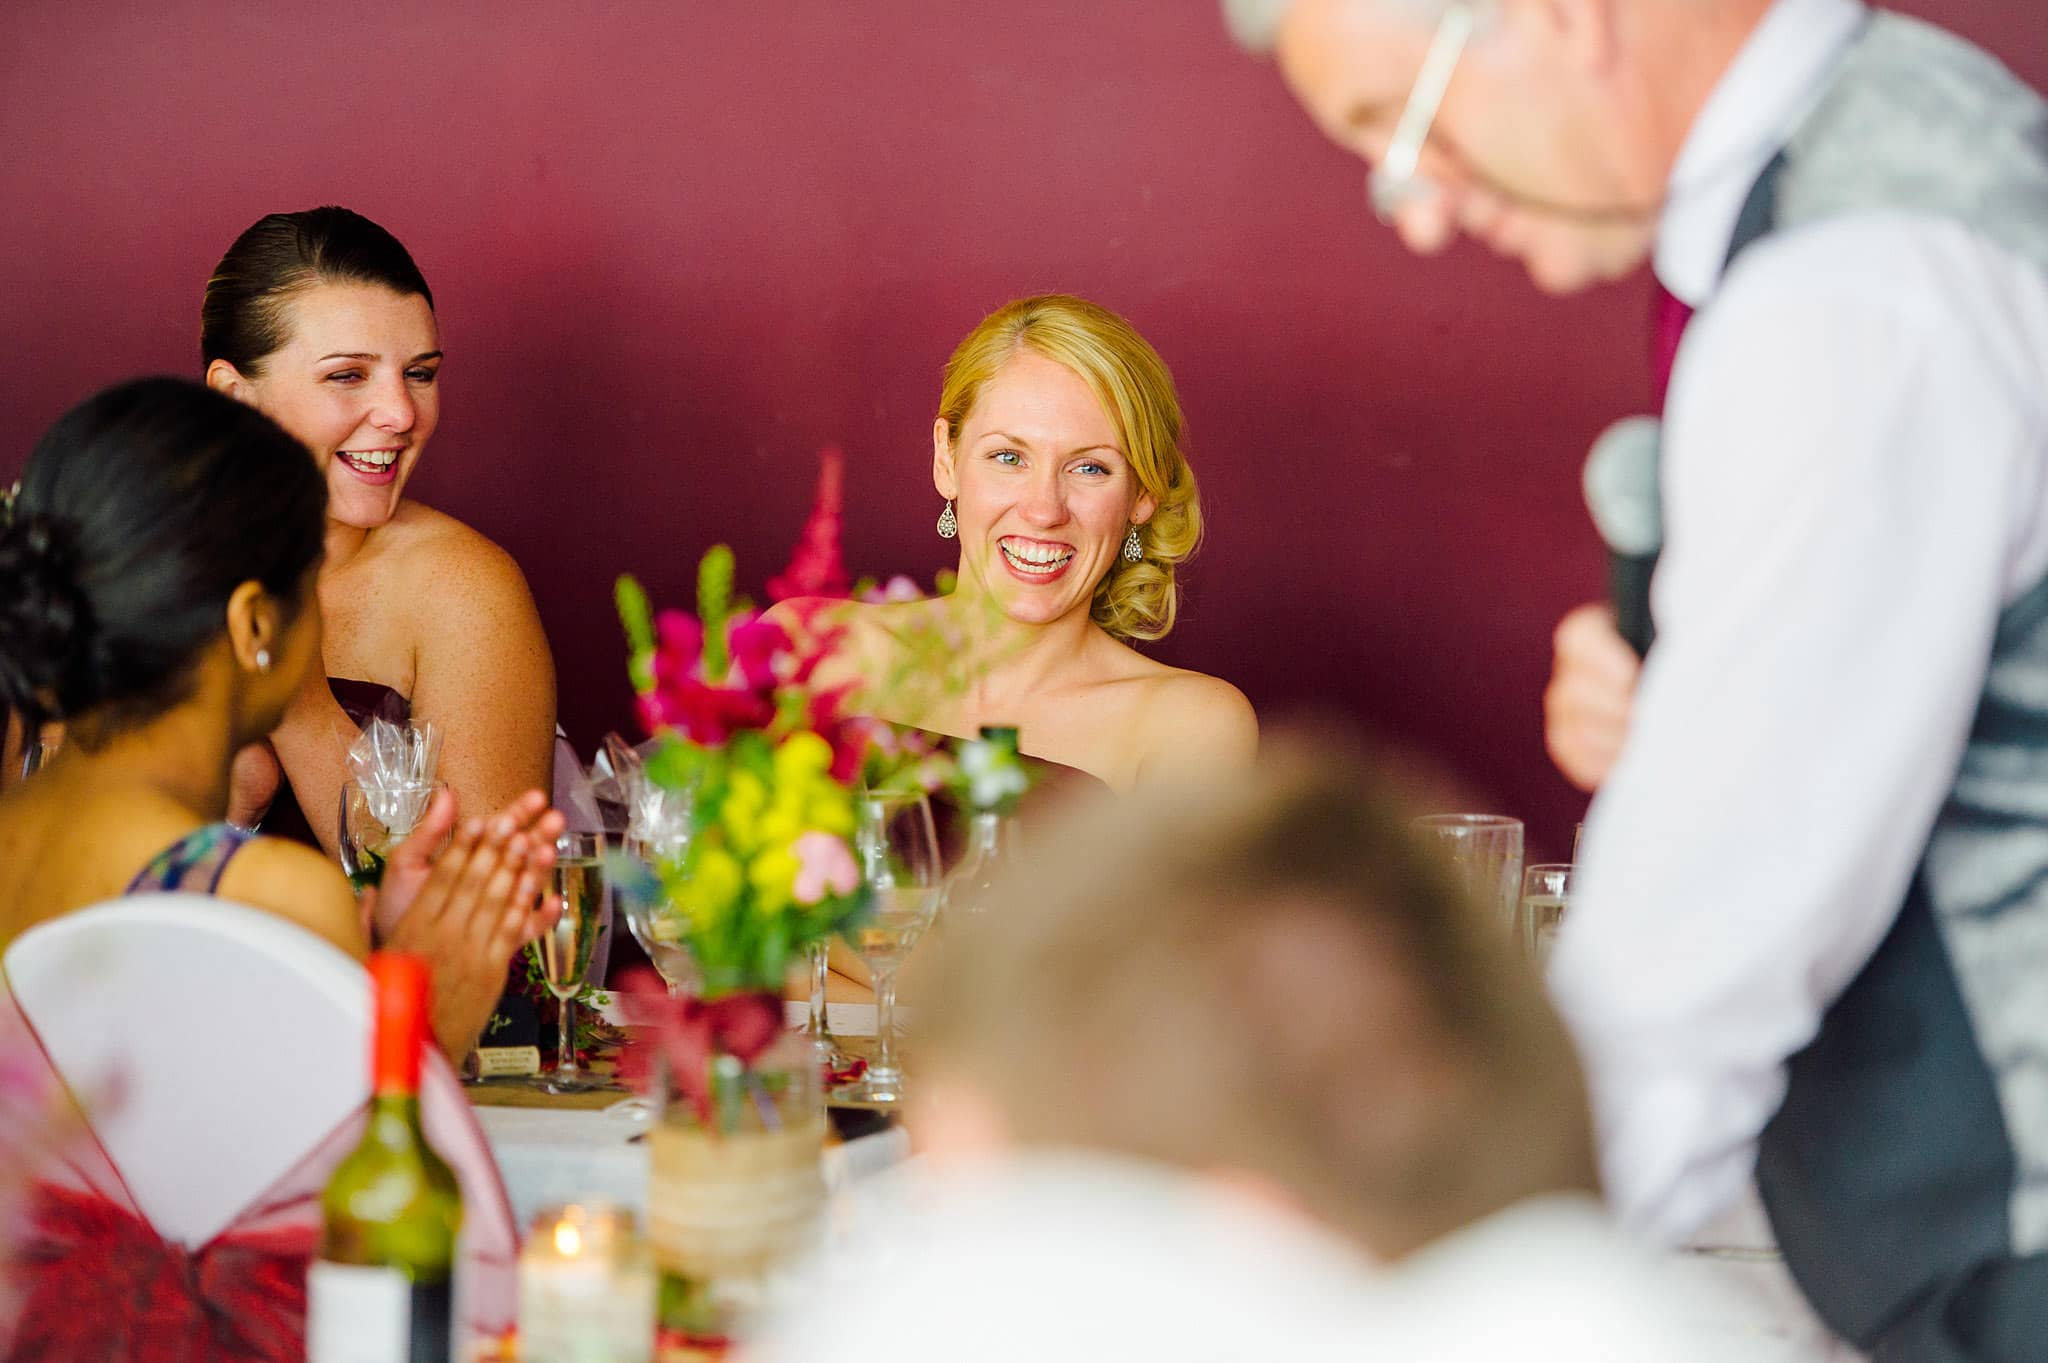 wedding-photographer-aberystwyth-wales (183)